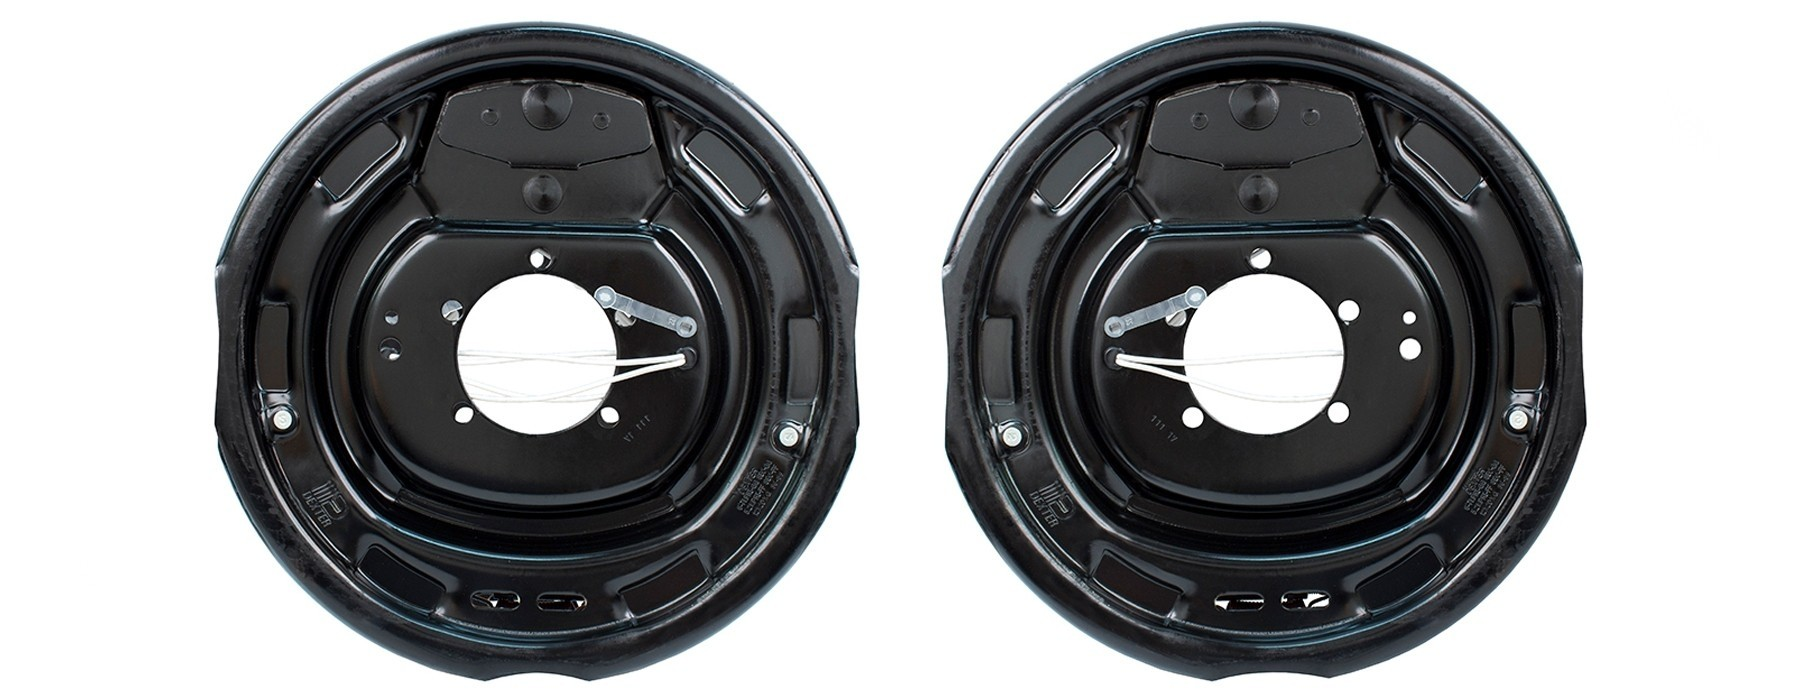 dexter® electric trailer brakes rh lh 6 000 lbs more views